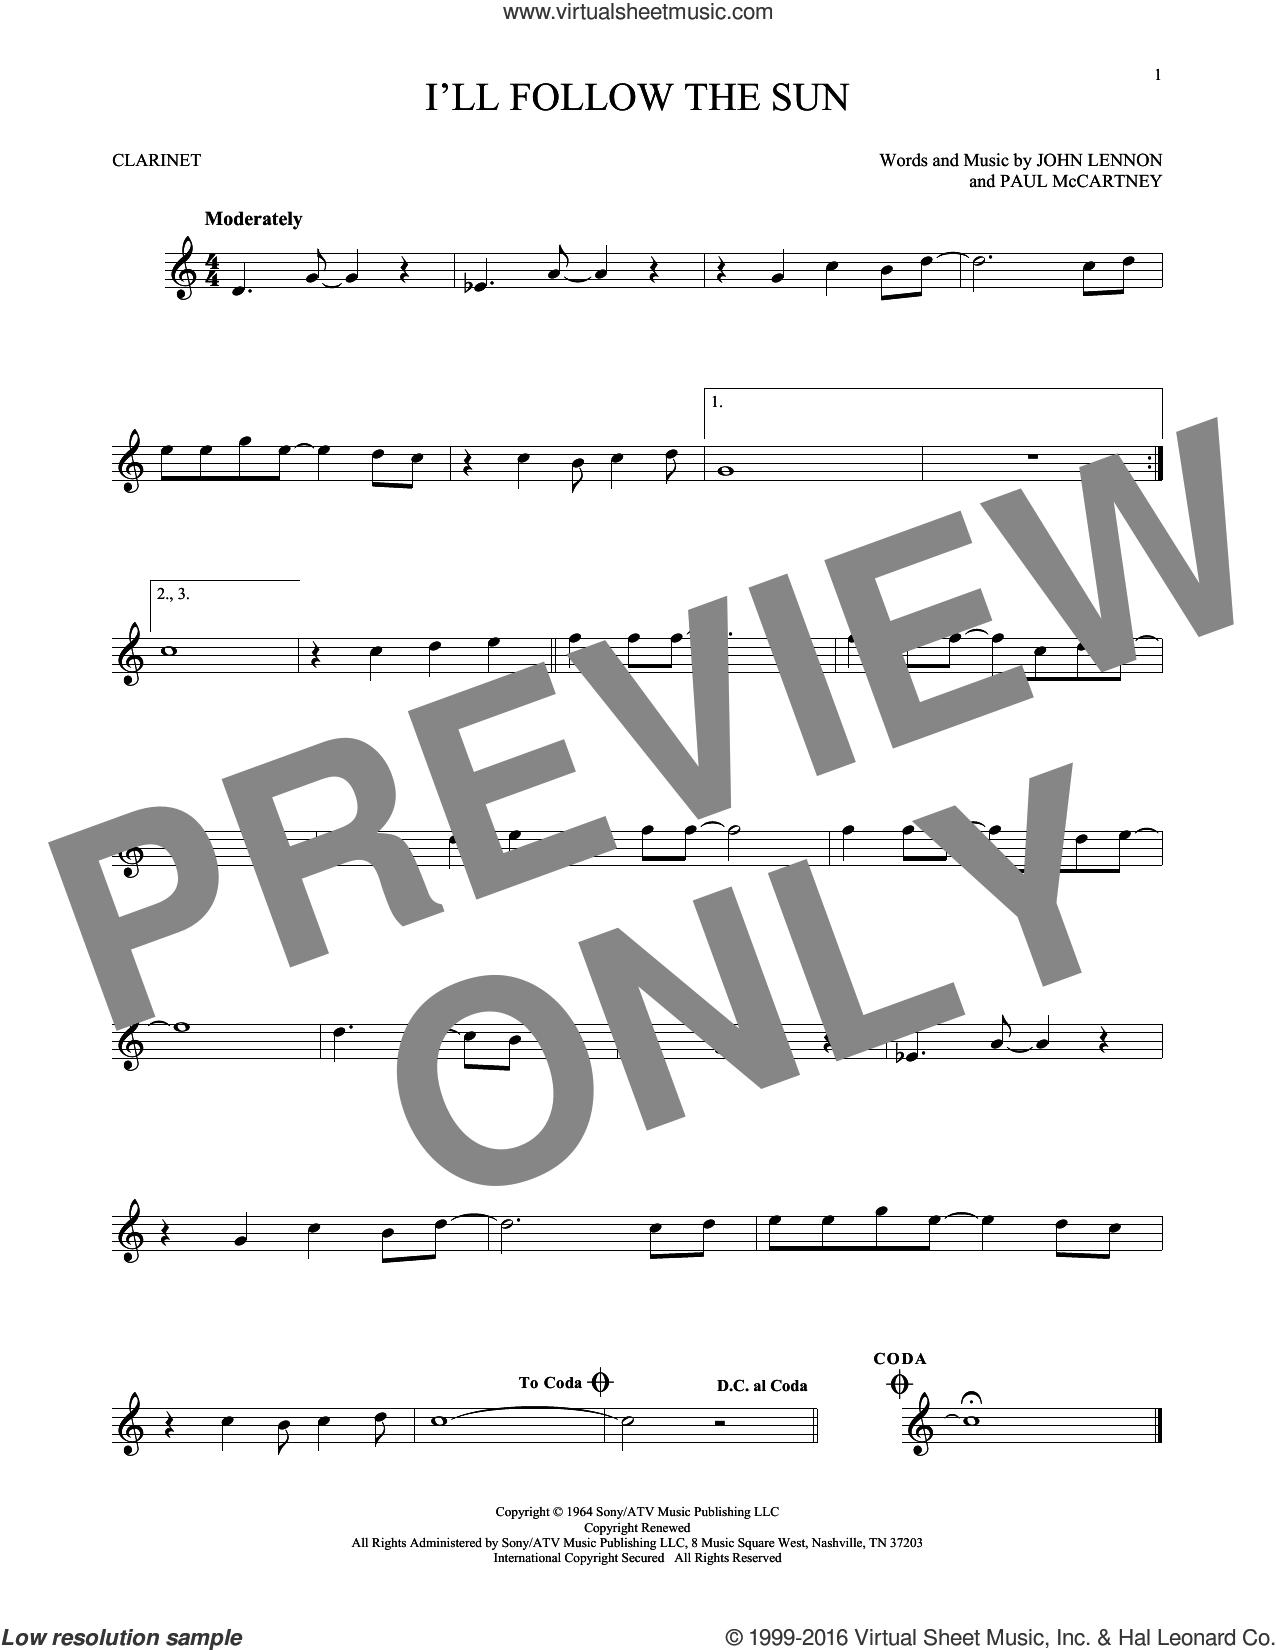 I'll Follow The Sun sheet music for clarinet solo by The Beatles, John Lennon and Paul McCartney, intermediate skill level